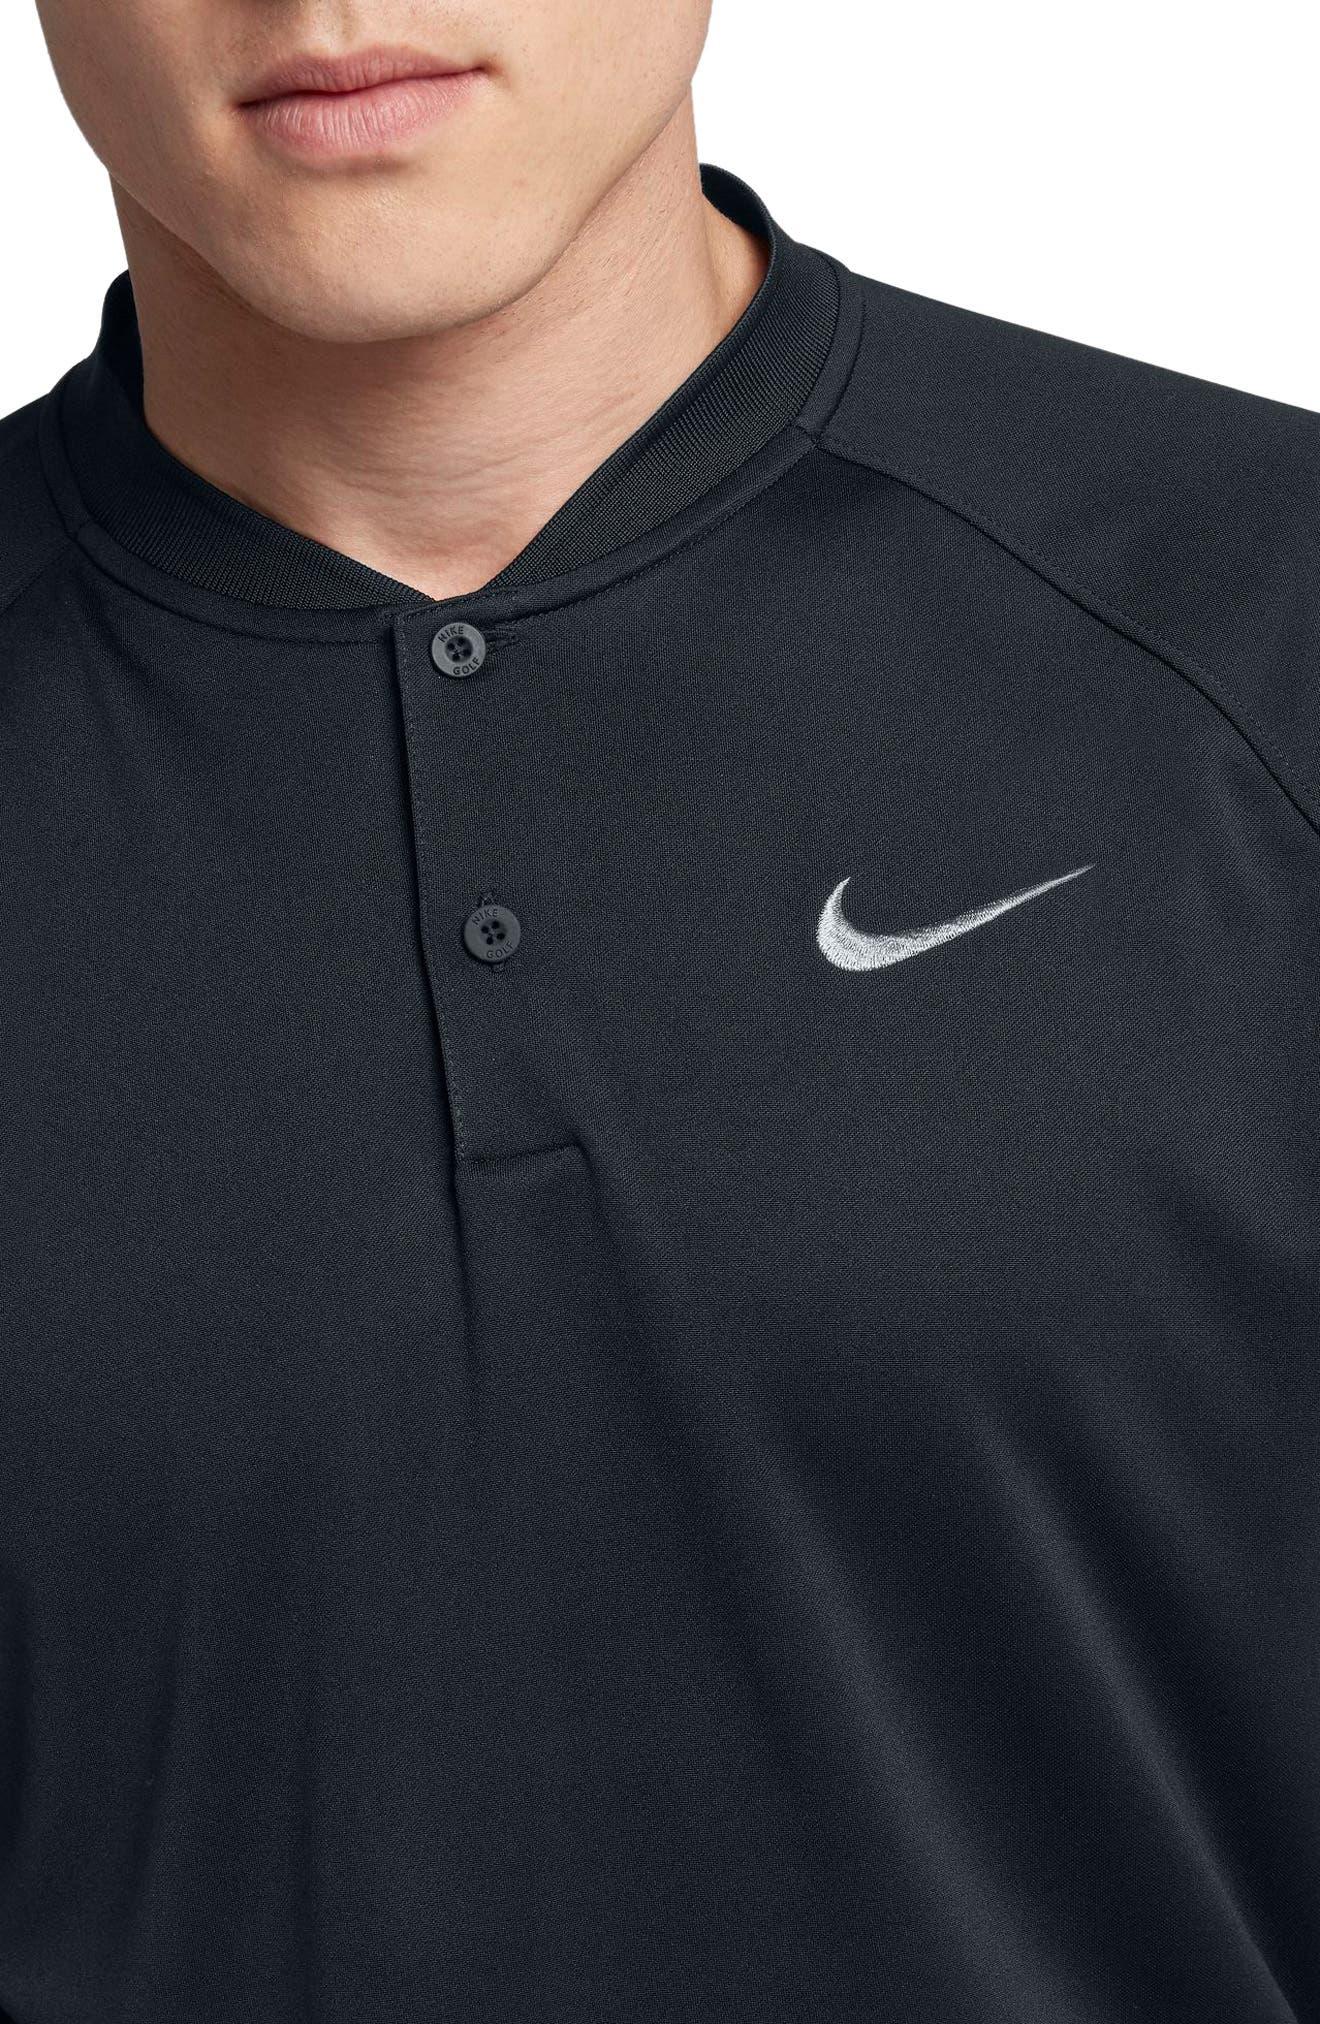 NIKE, Momentum Dri-FIT Golf Polo, Alternate thumbnail 4, color, BLACK/ BLACK/ GUNSMOKE